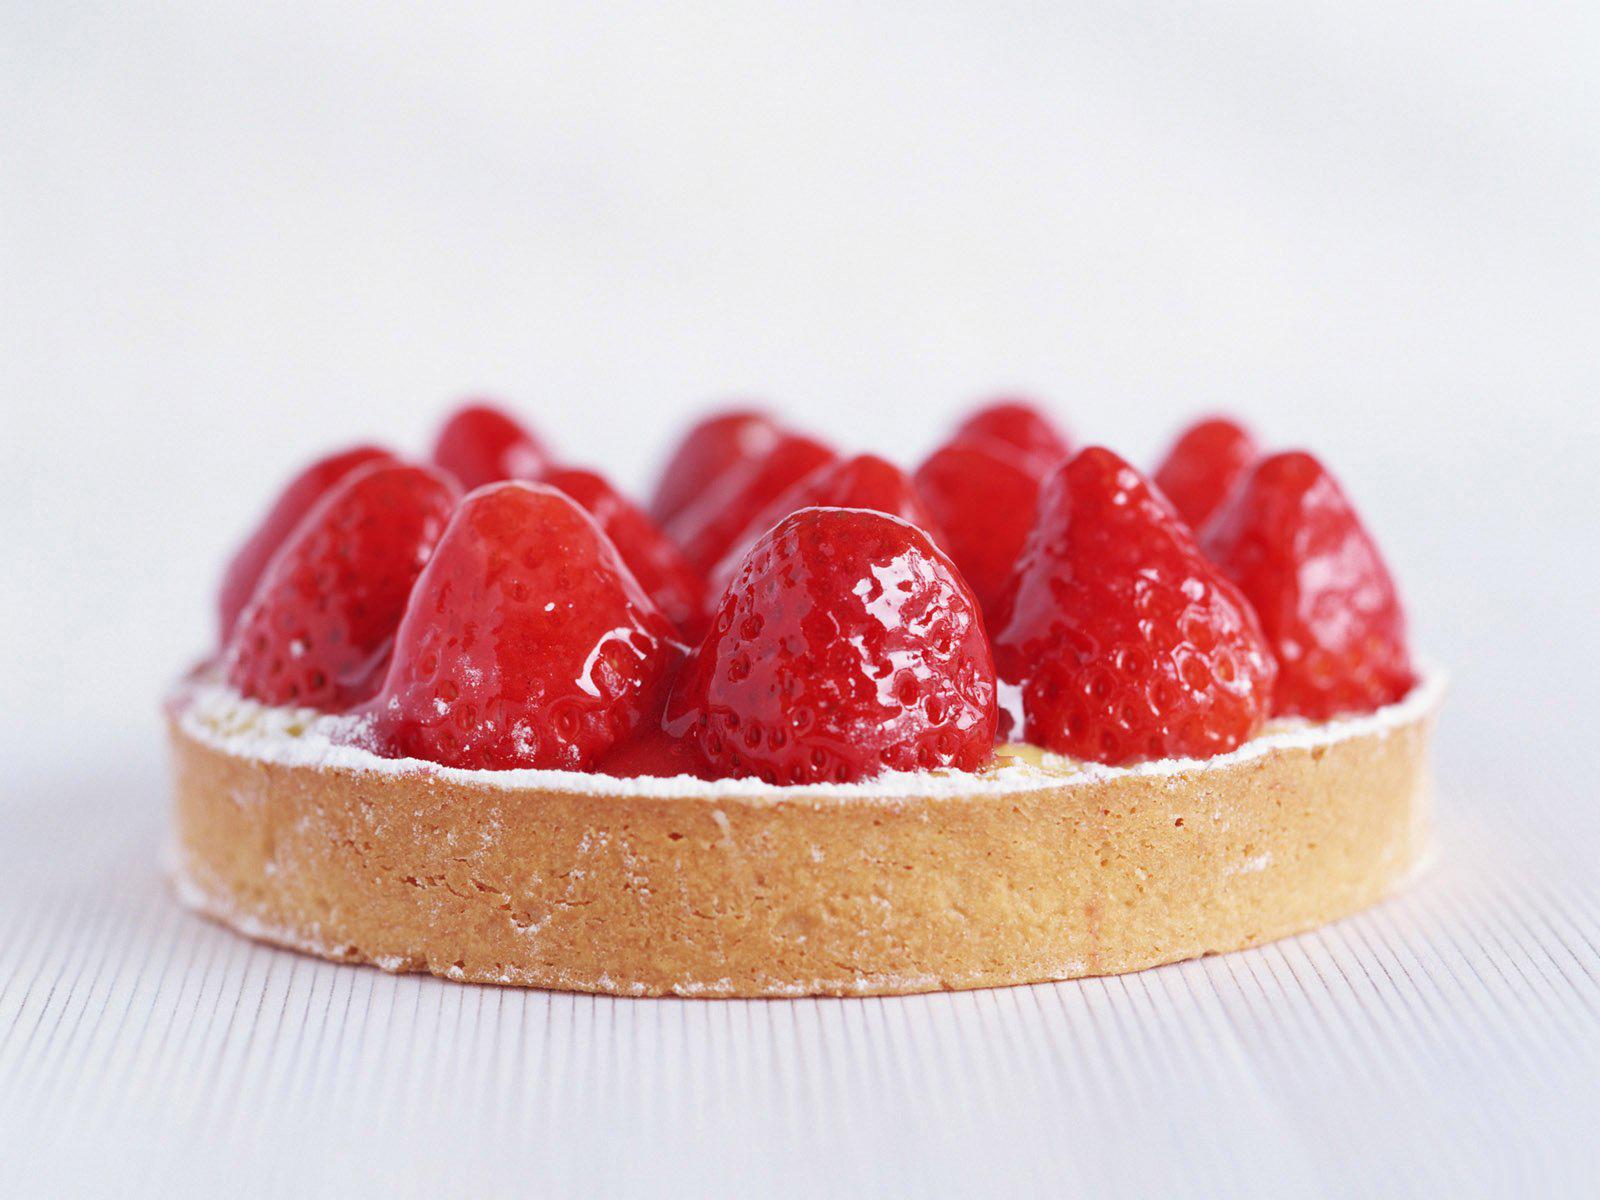 Strawberry Tarts Wallpaper